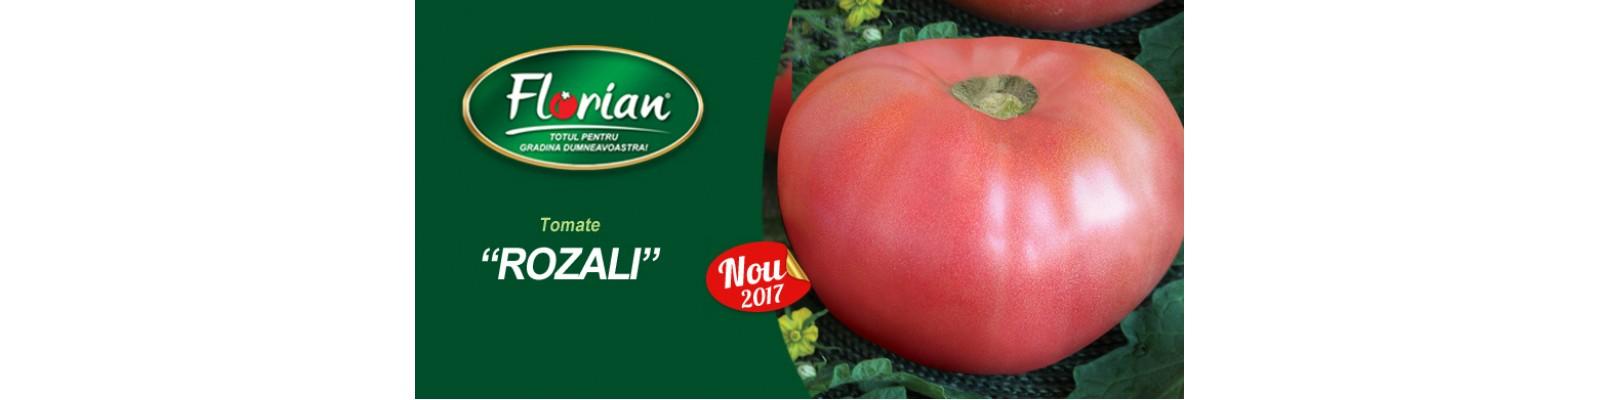 Un soi nou de tomate - Rozali